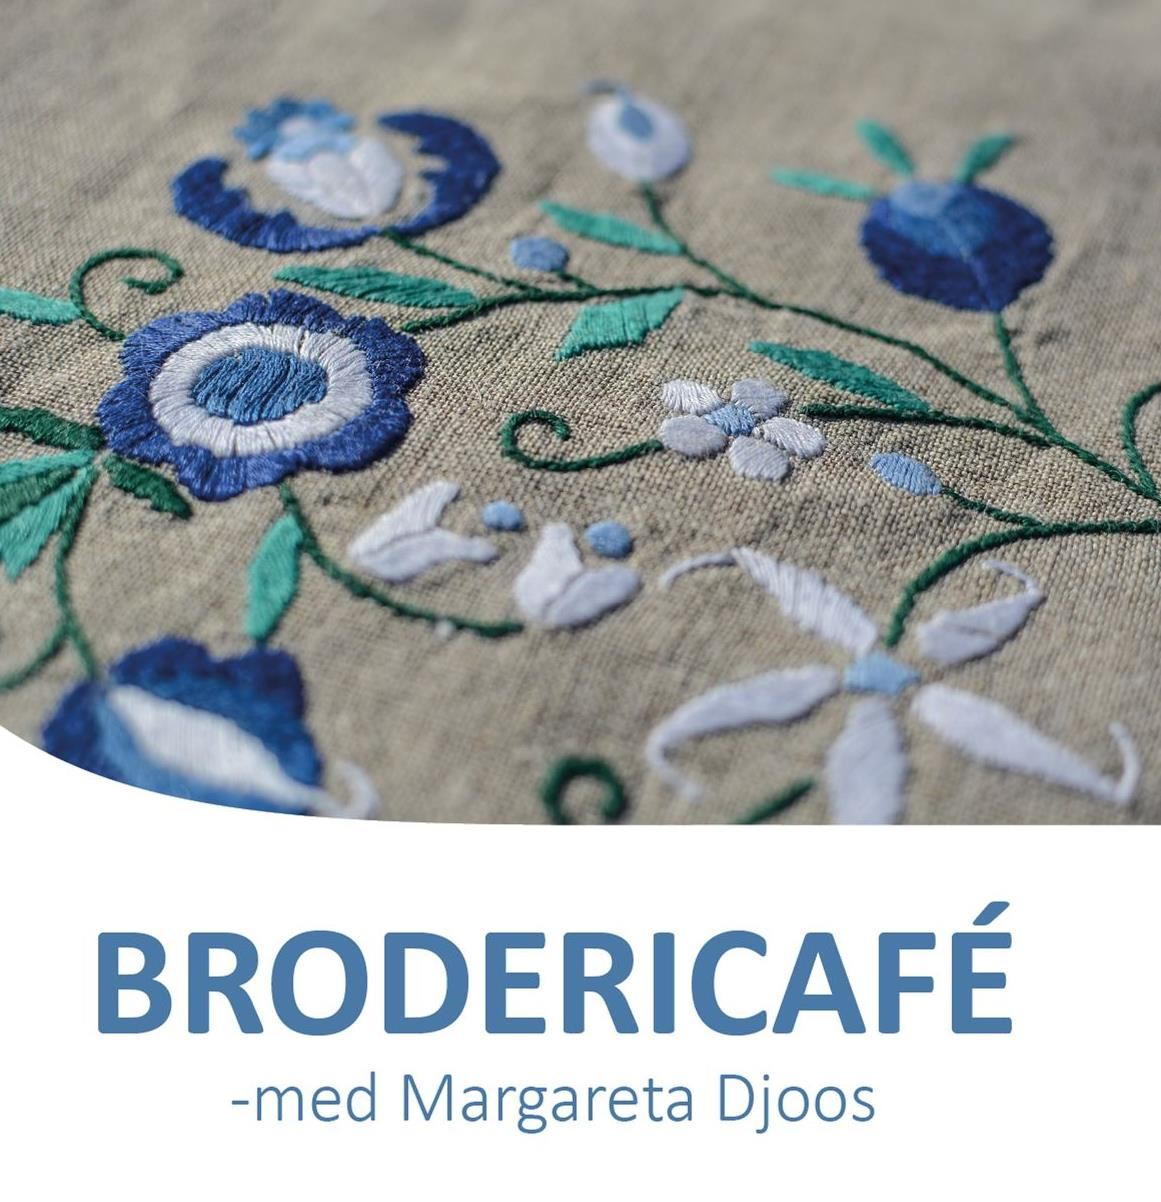 Brodericafé med Margareta Djoos